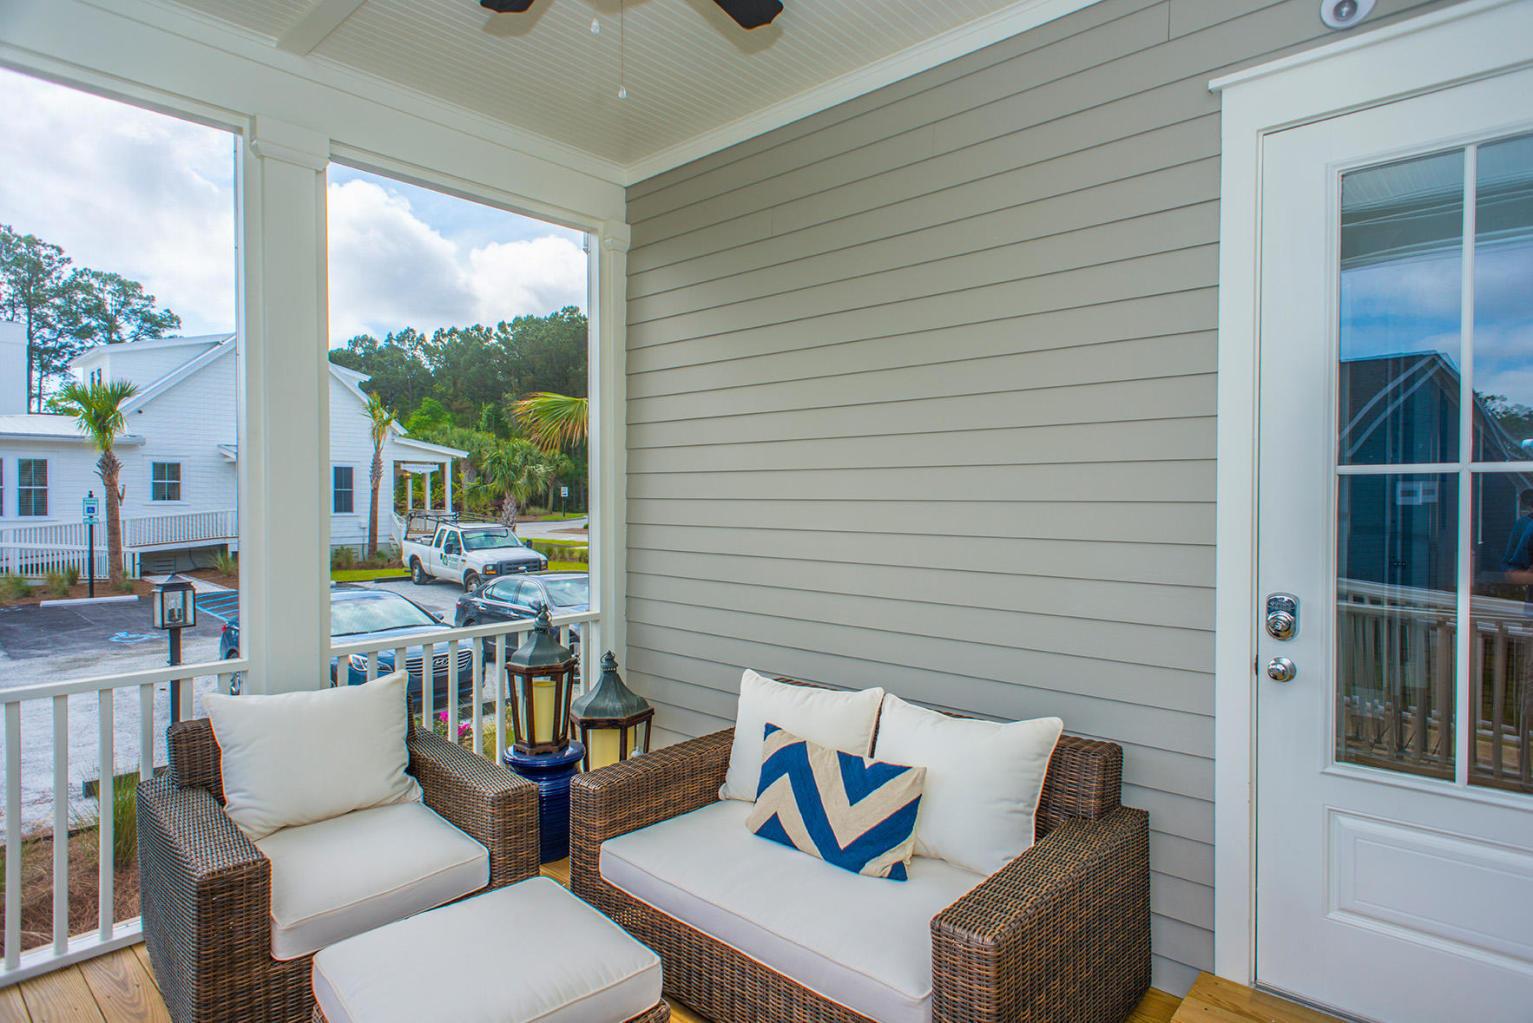 Carolina Park Homes For Sale - 1534 Banning, Mount Pleasant, SC - 2